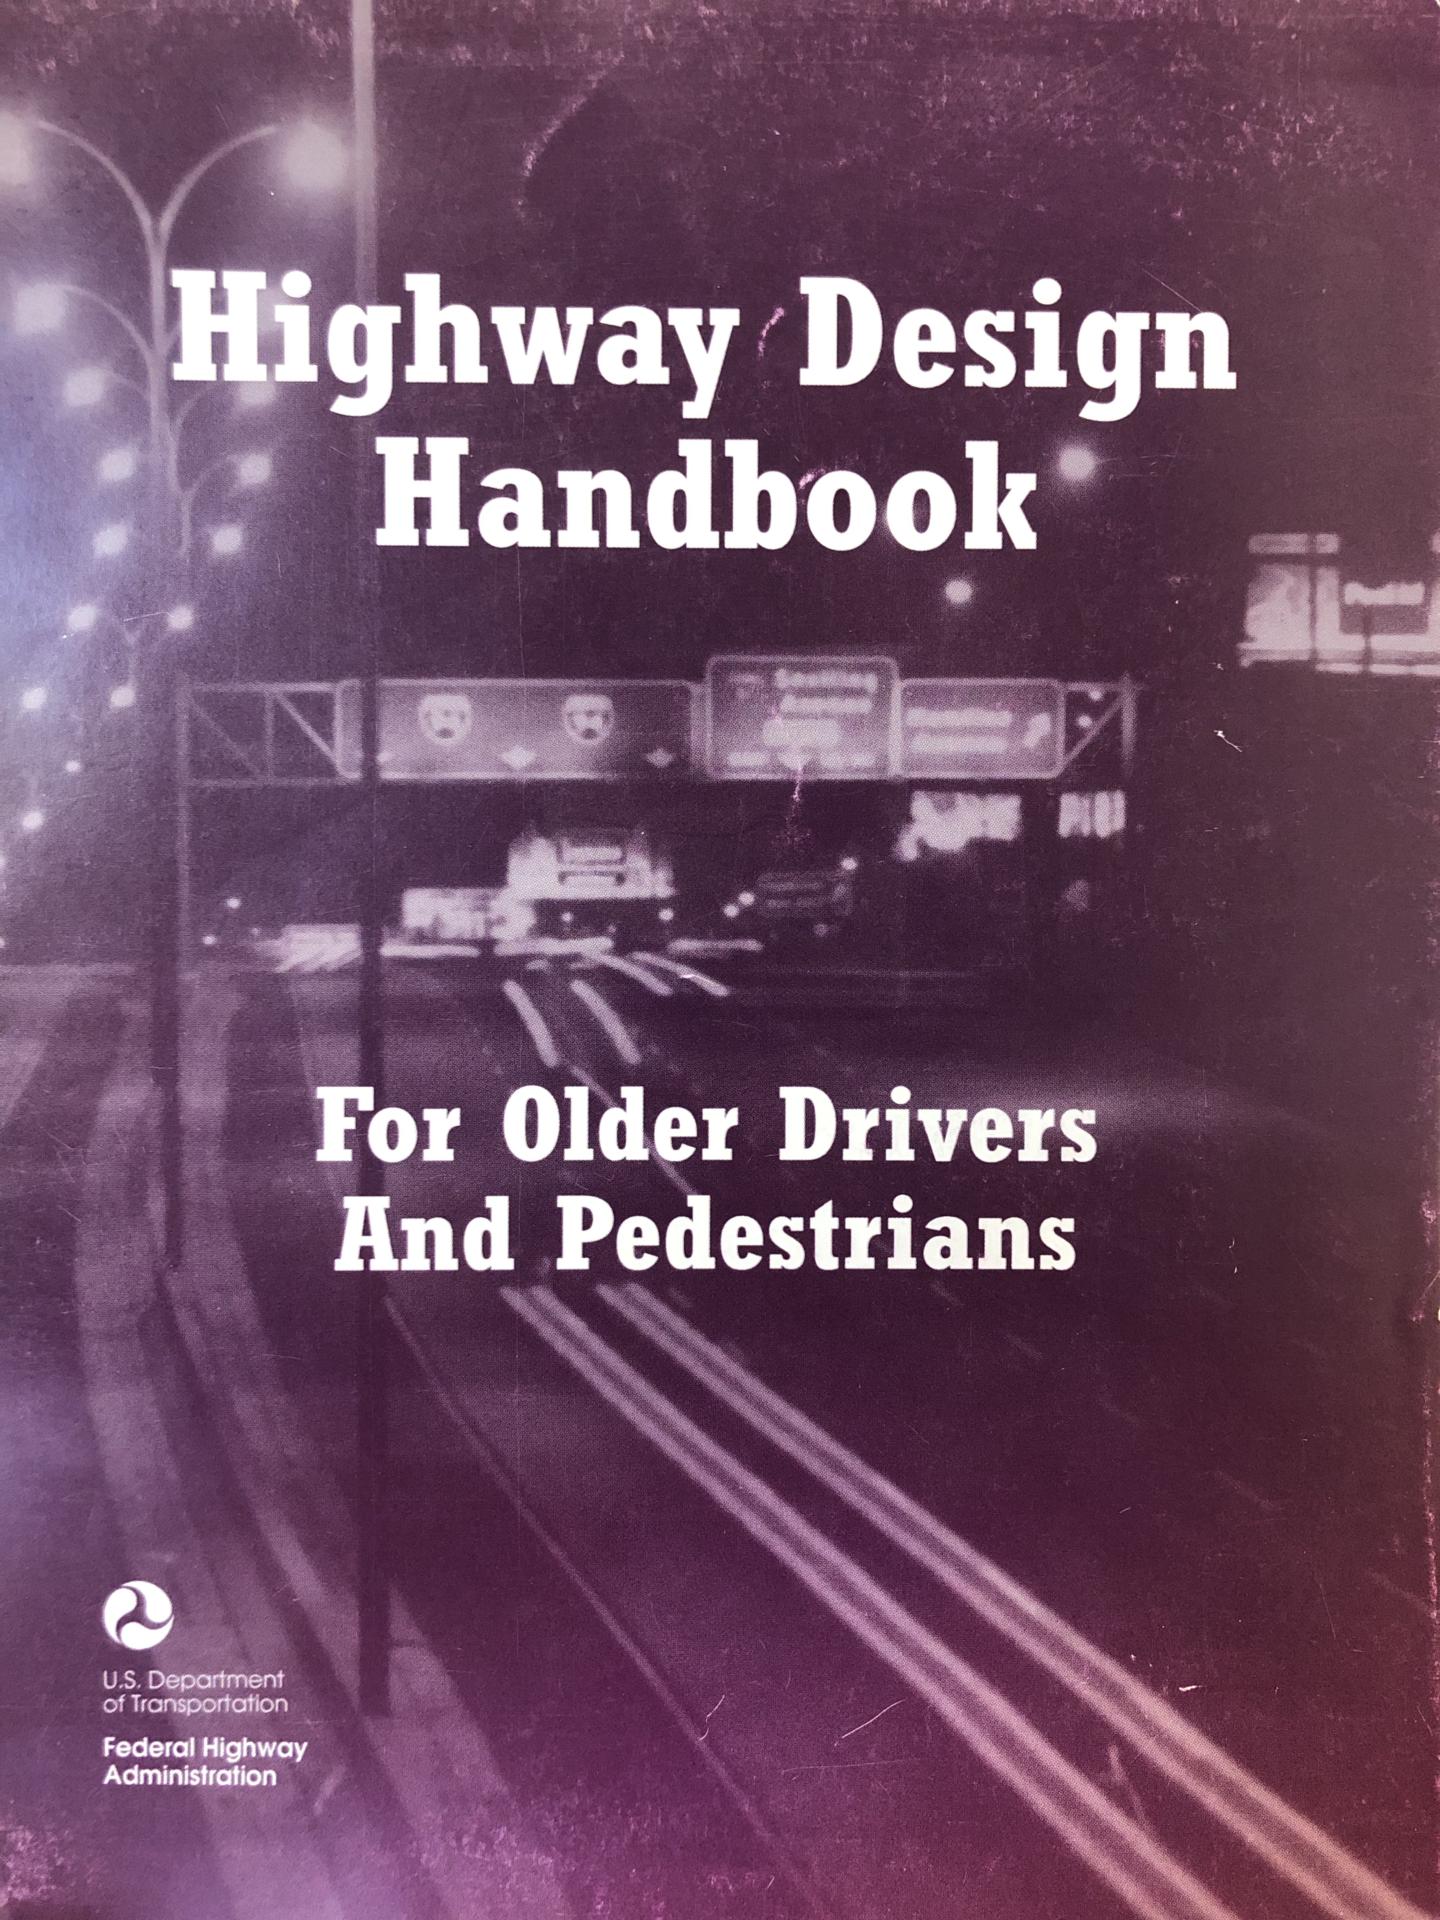 Highway Design Handbook for Older Drivers and Pedestrians [PUB]